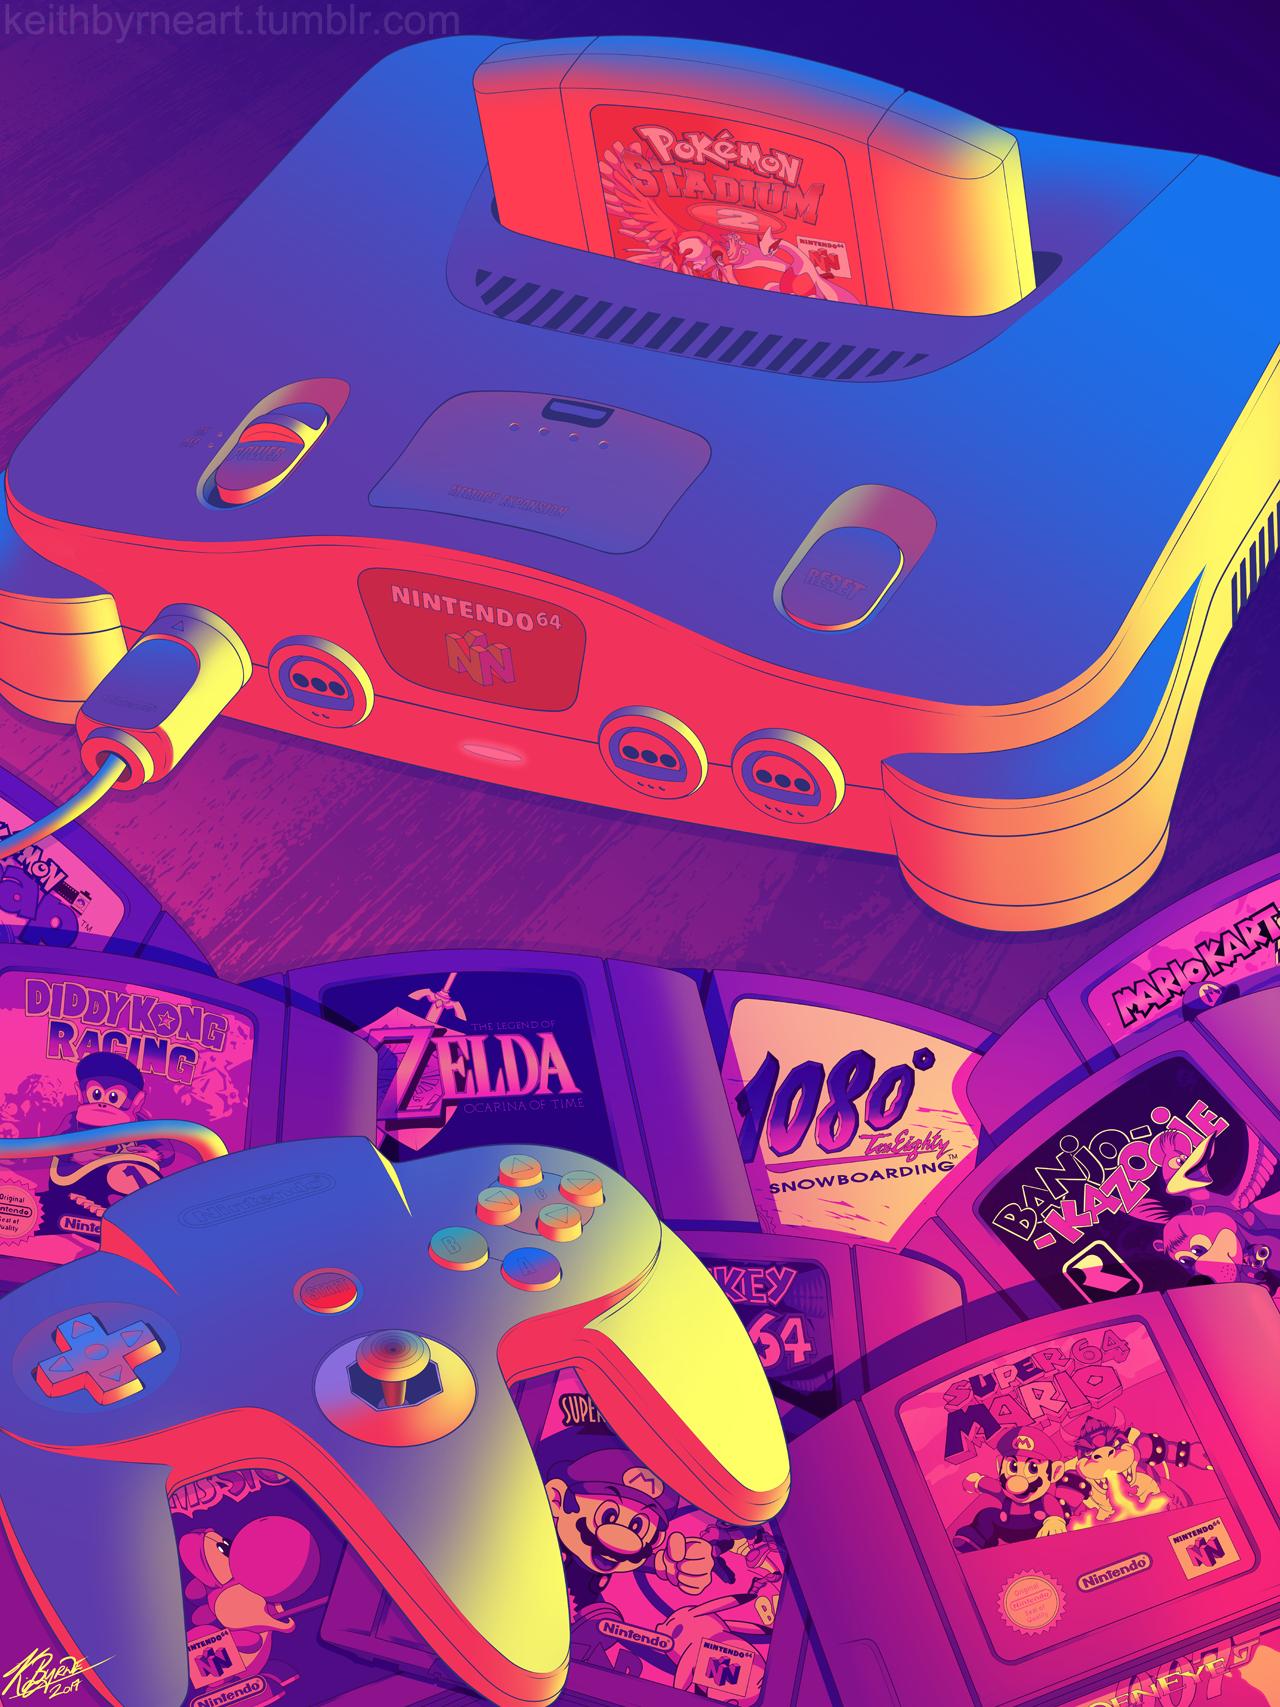 Keith Byrne Still Feeling Very Nostalgic Retro Gaming Art Retro Video Games Vaporwave